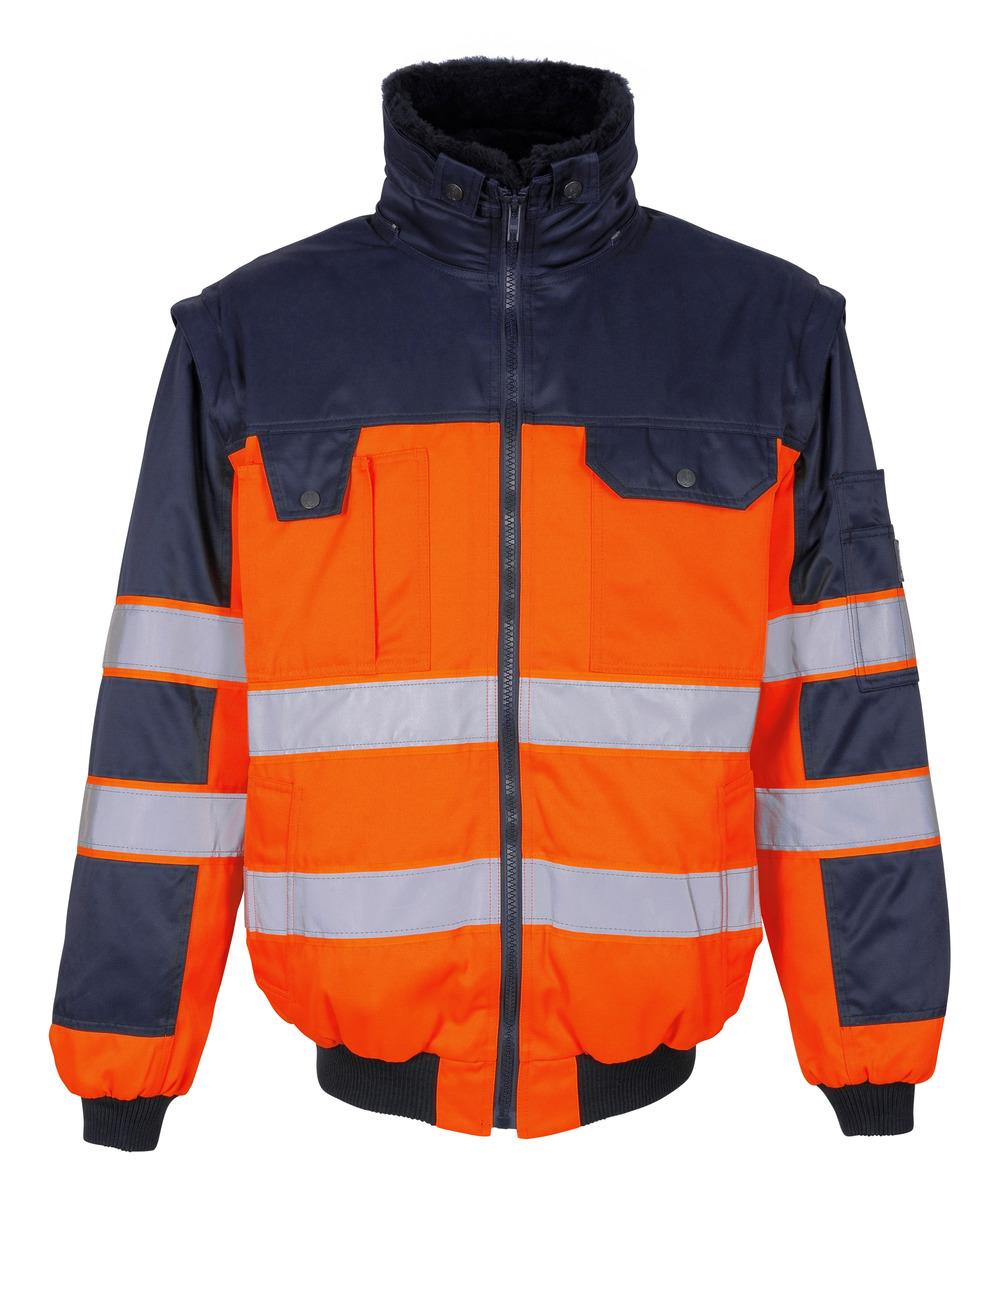 00920-660-141 Pilotjacka - hi-vis orange/marin